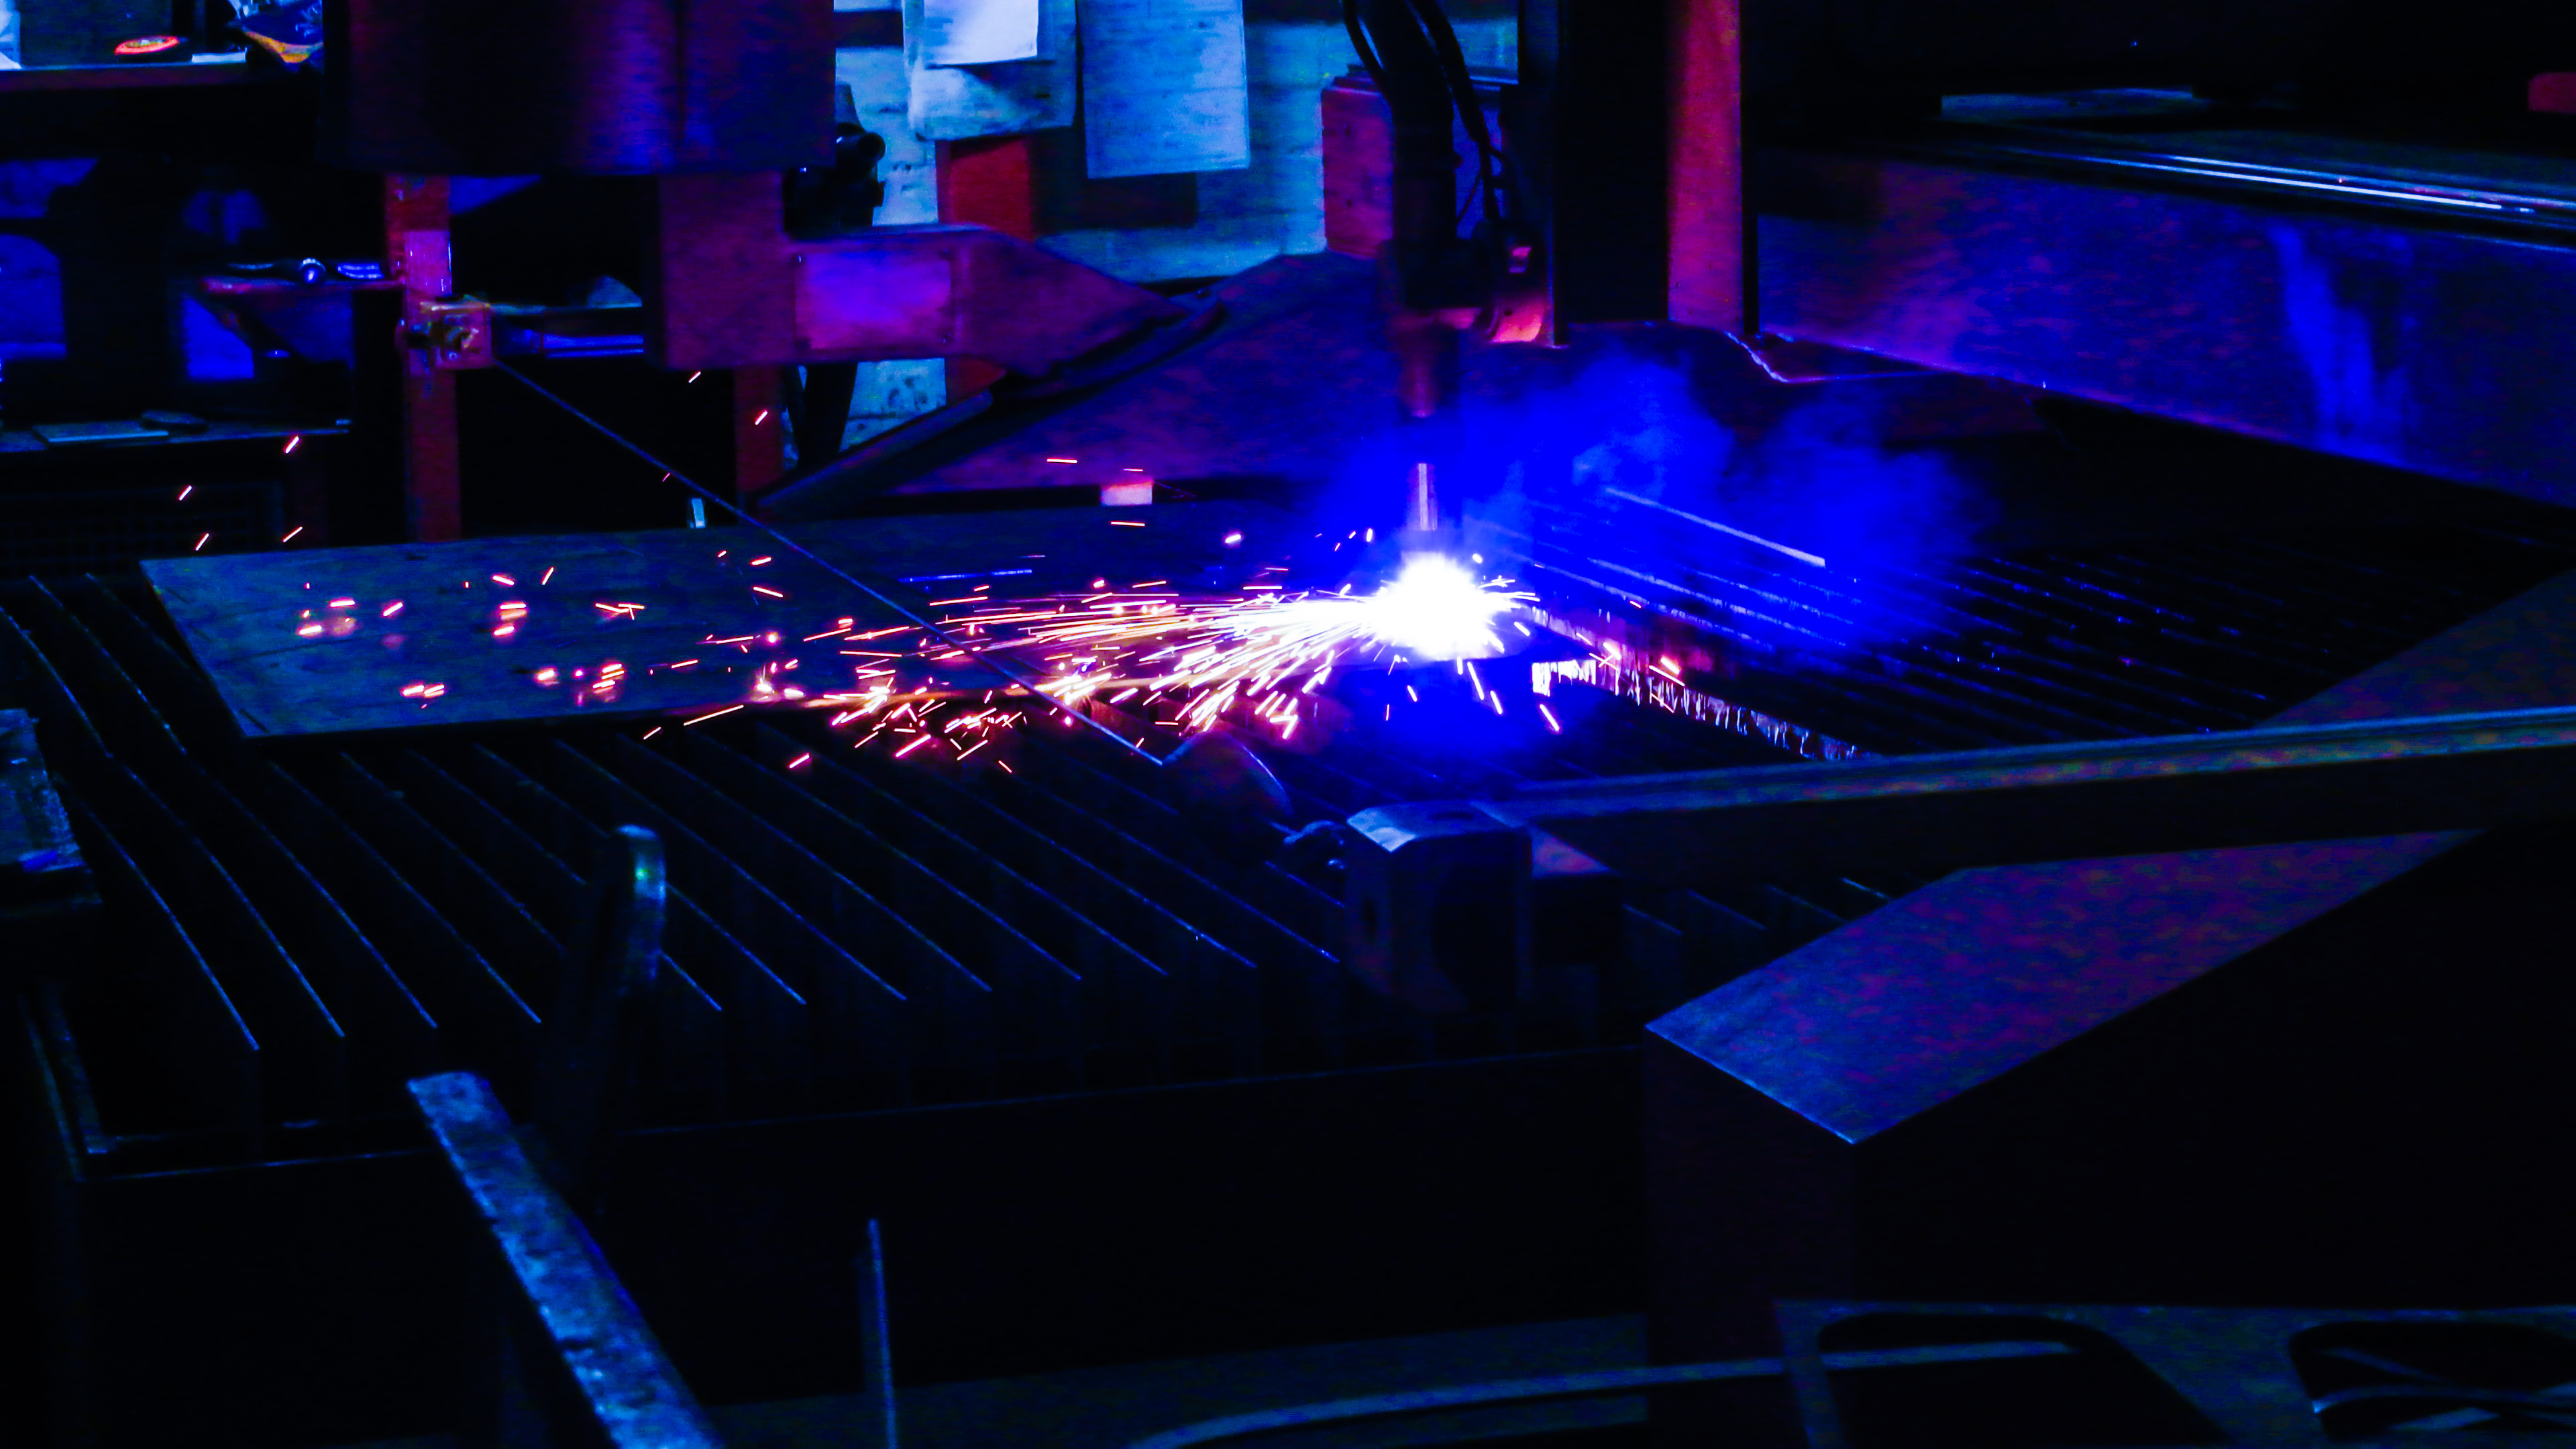 Plasma Cutter Blue Hue.jpg